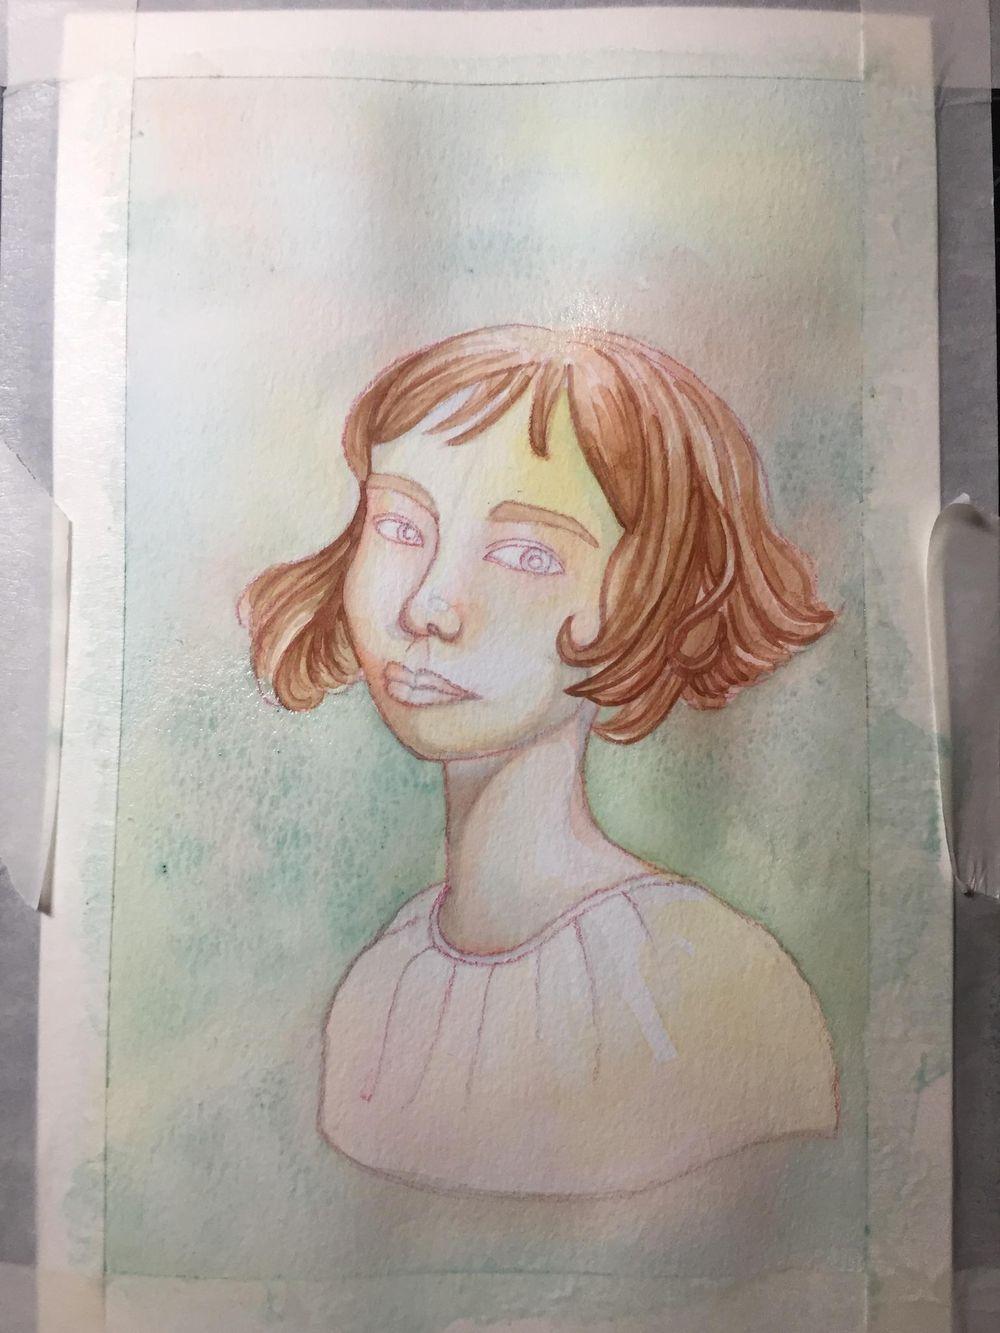 Rainbow Skin Portrait - image 3 - student project